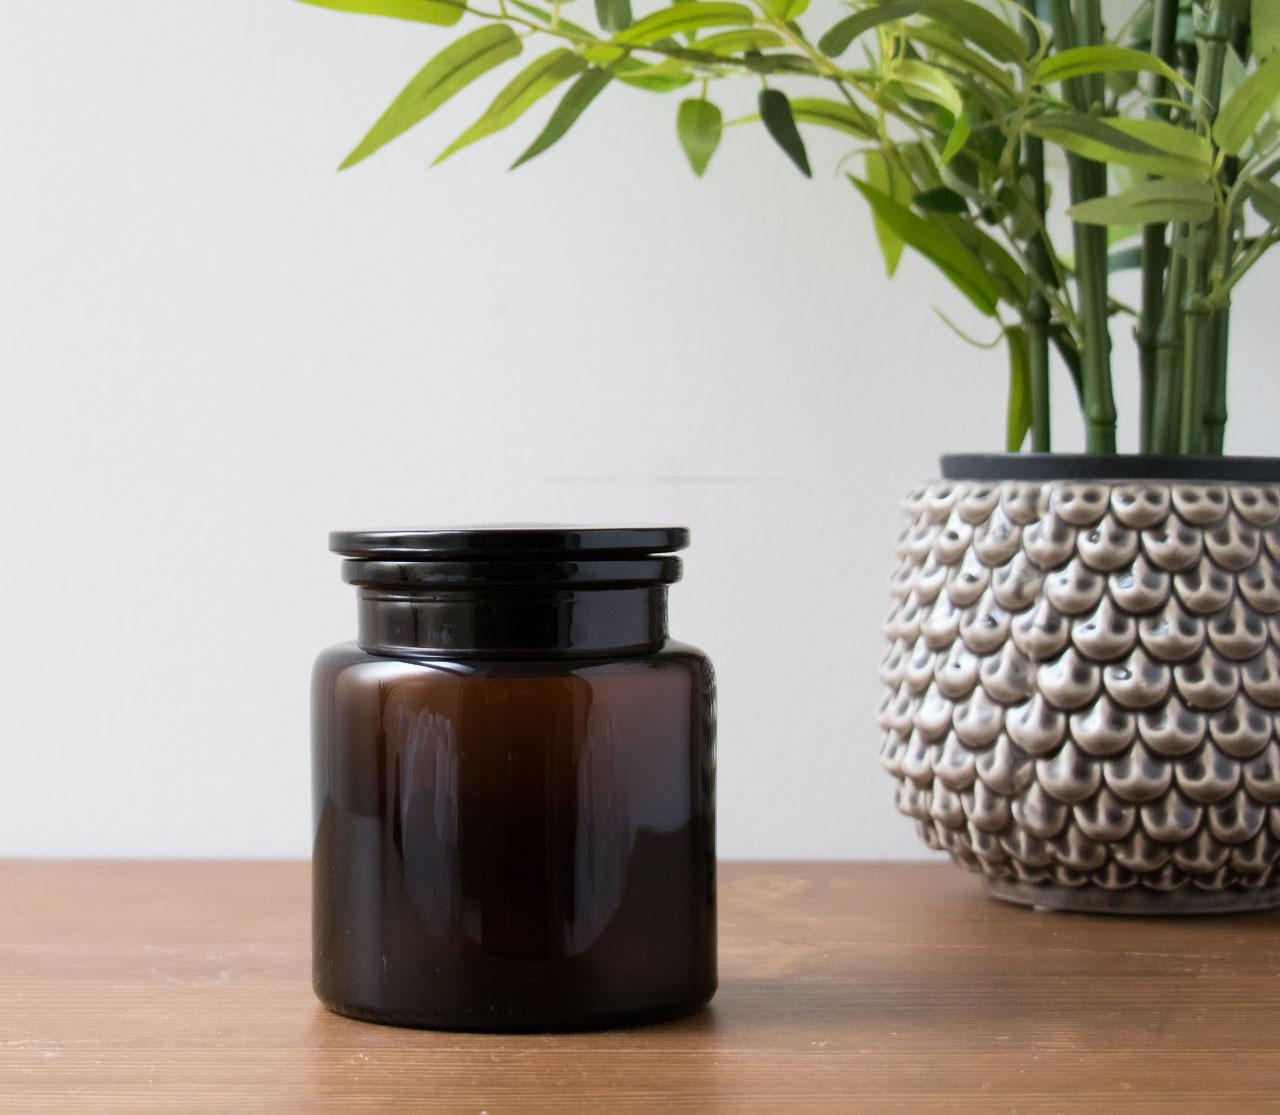 Pot en verre brun bloomingville - Maison Mathuvu